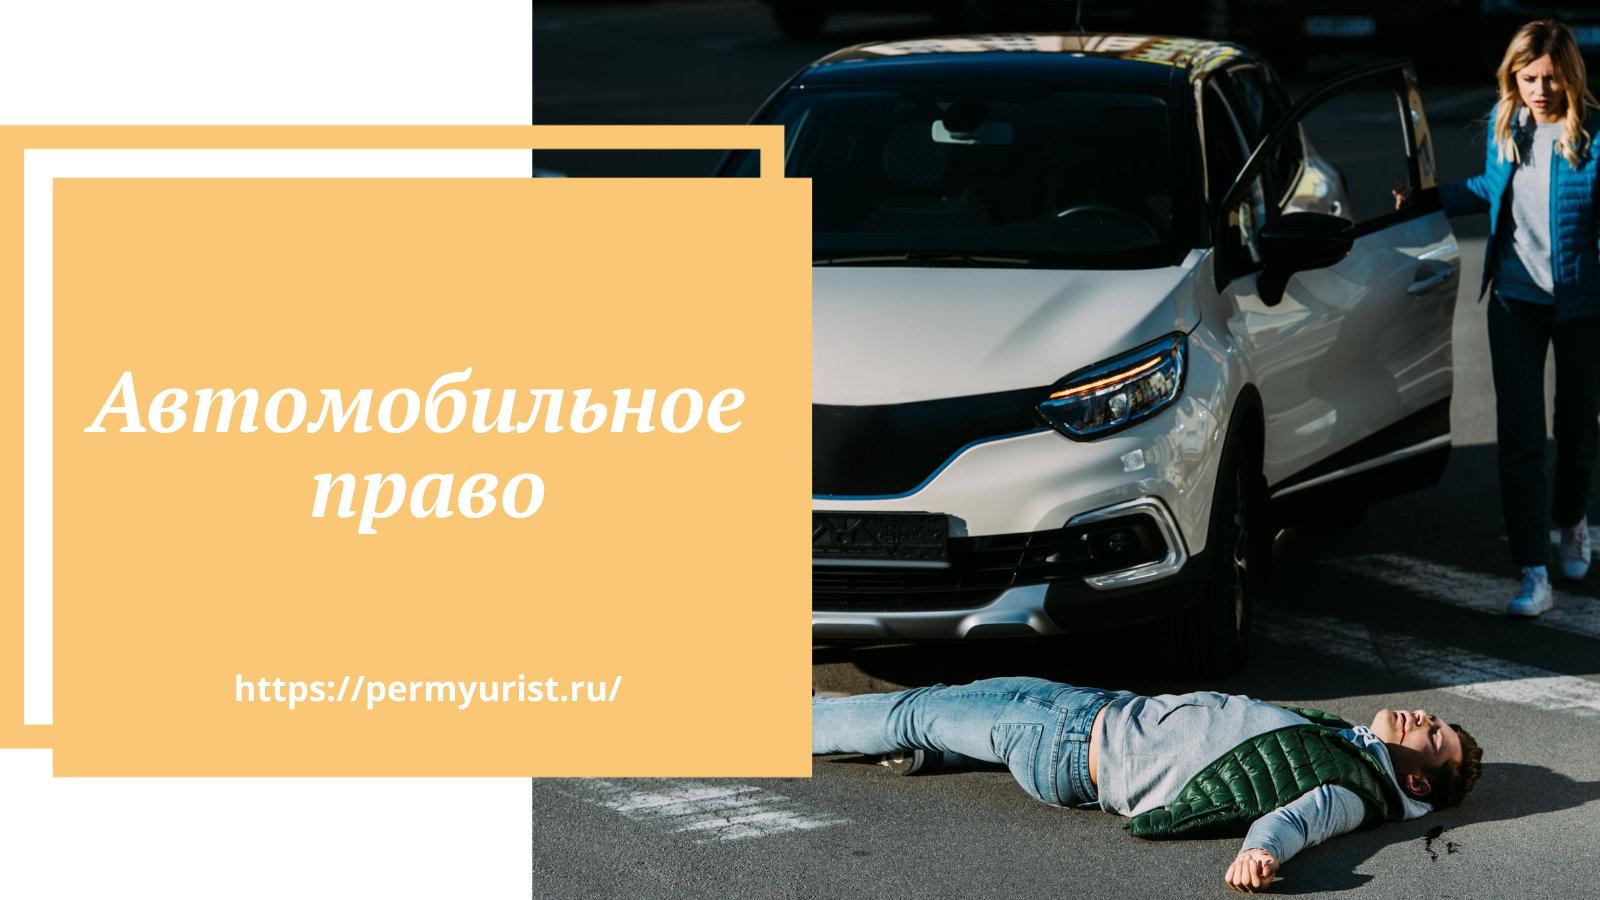 Автоюрист от компании Юрист Пермь